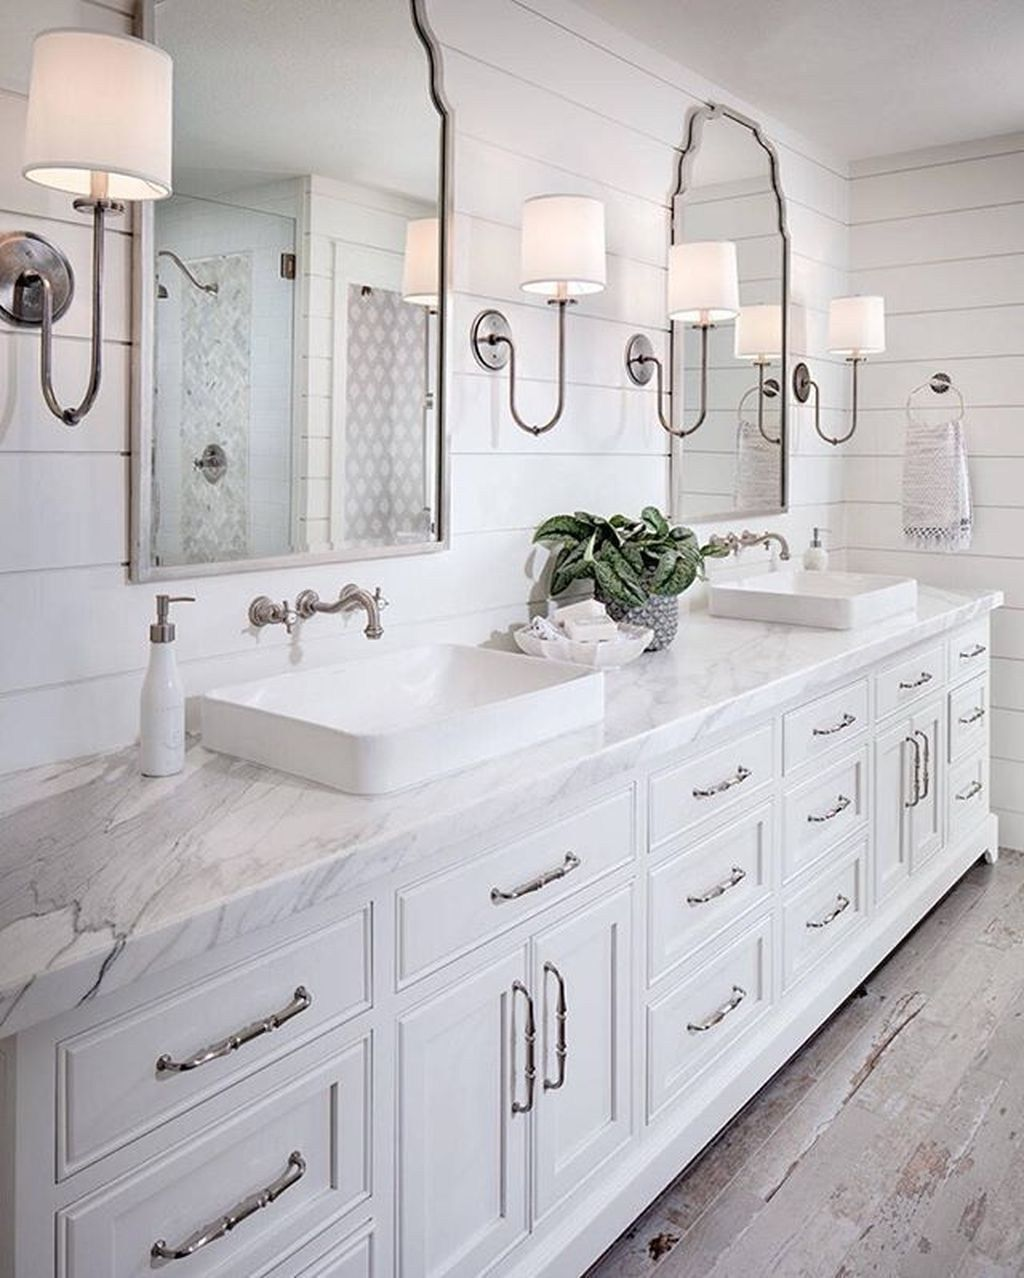 Beautiful Modern Master Bathrooms To Beautiful Modern Master Bathroom Design Ideas 30 31 Bathrooms